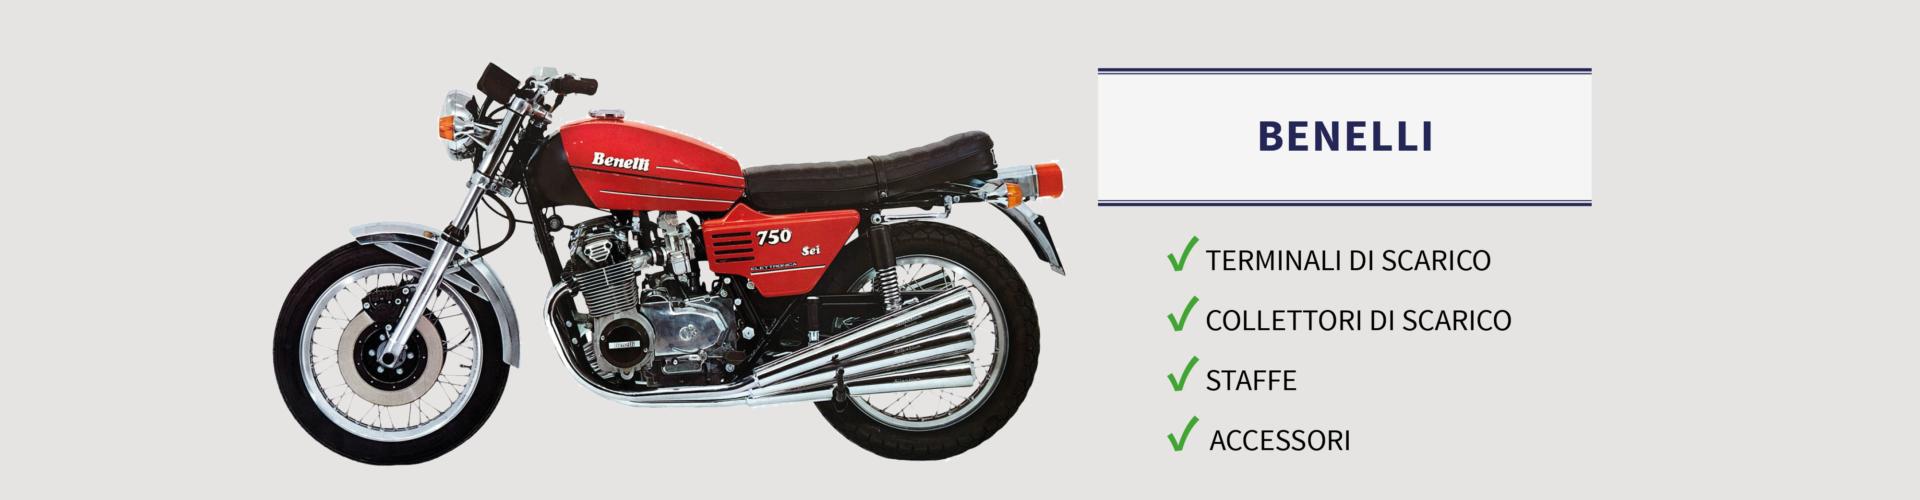 moto-storiche-italiane-terminali-moto-epoca-benelli-750-b